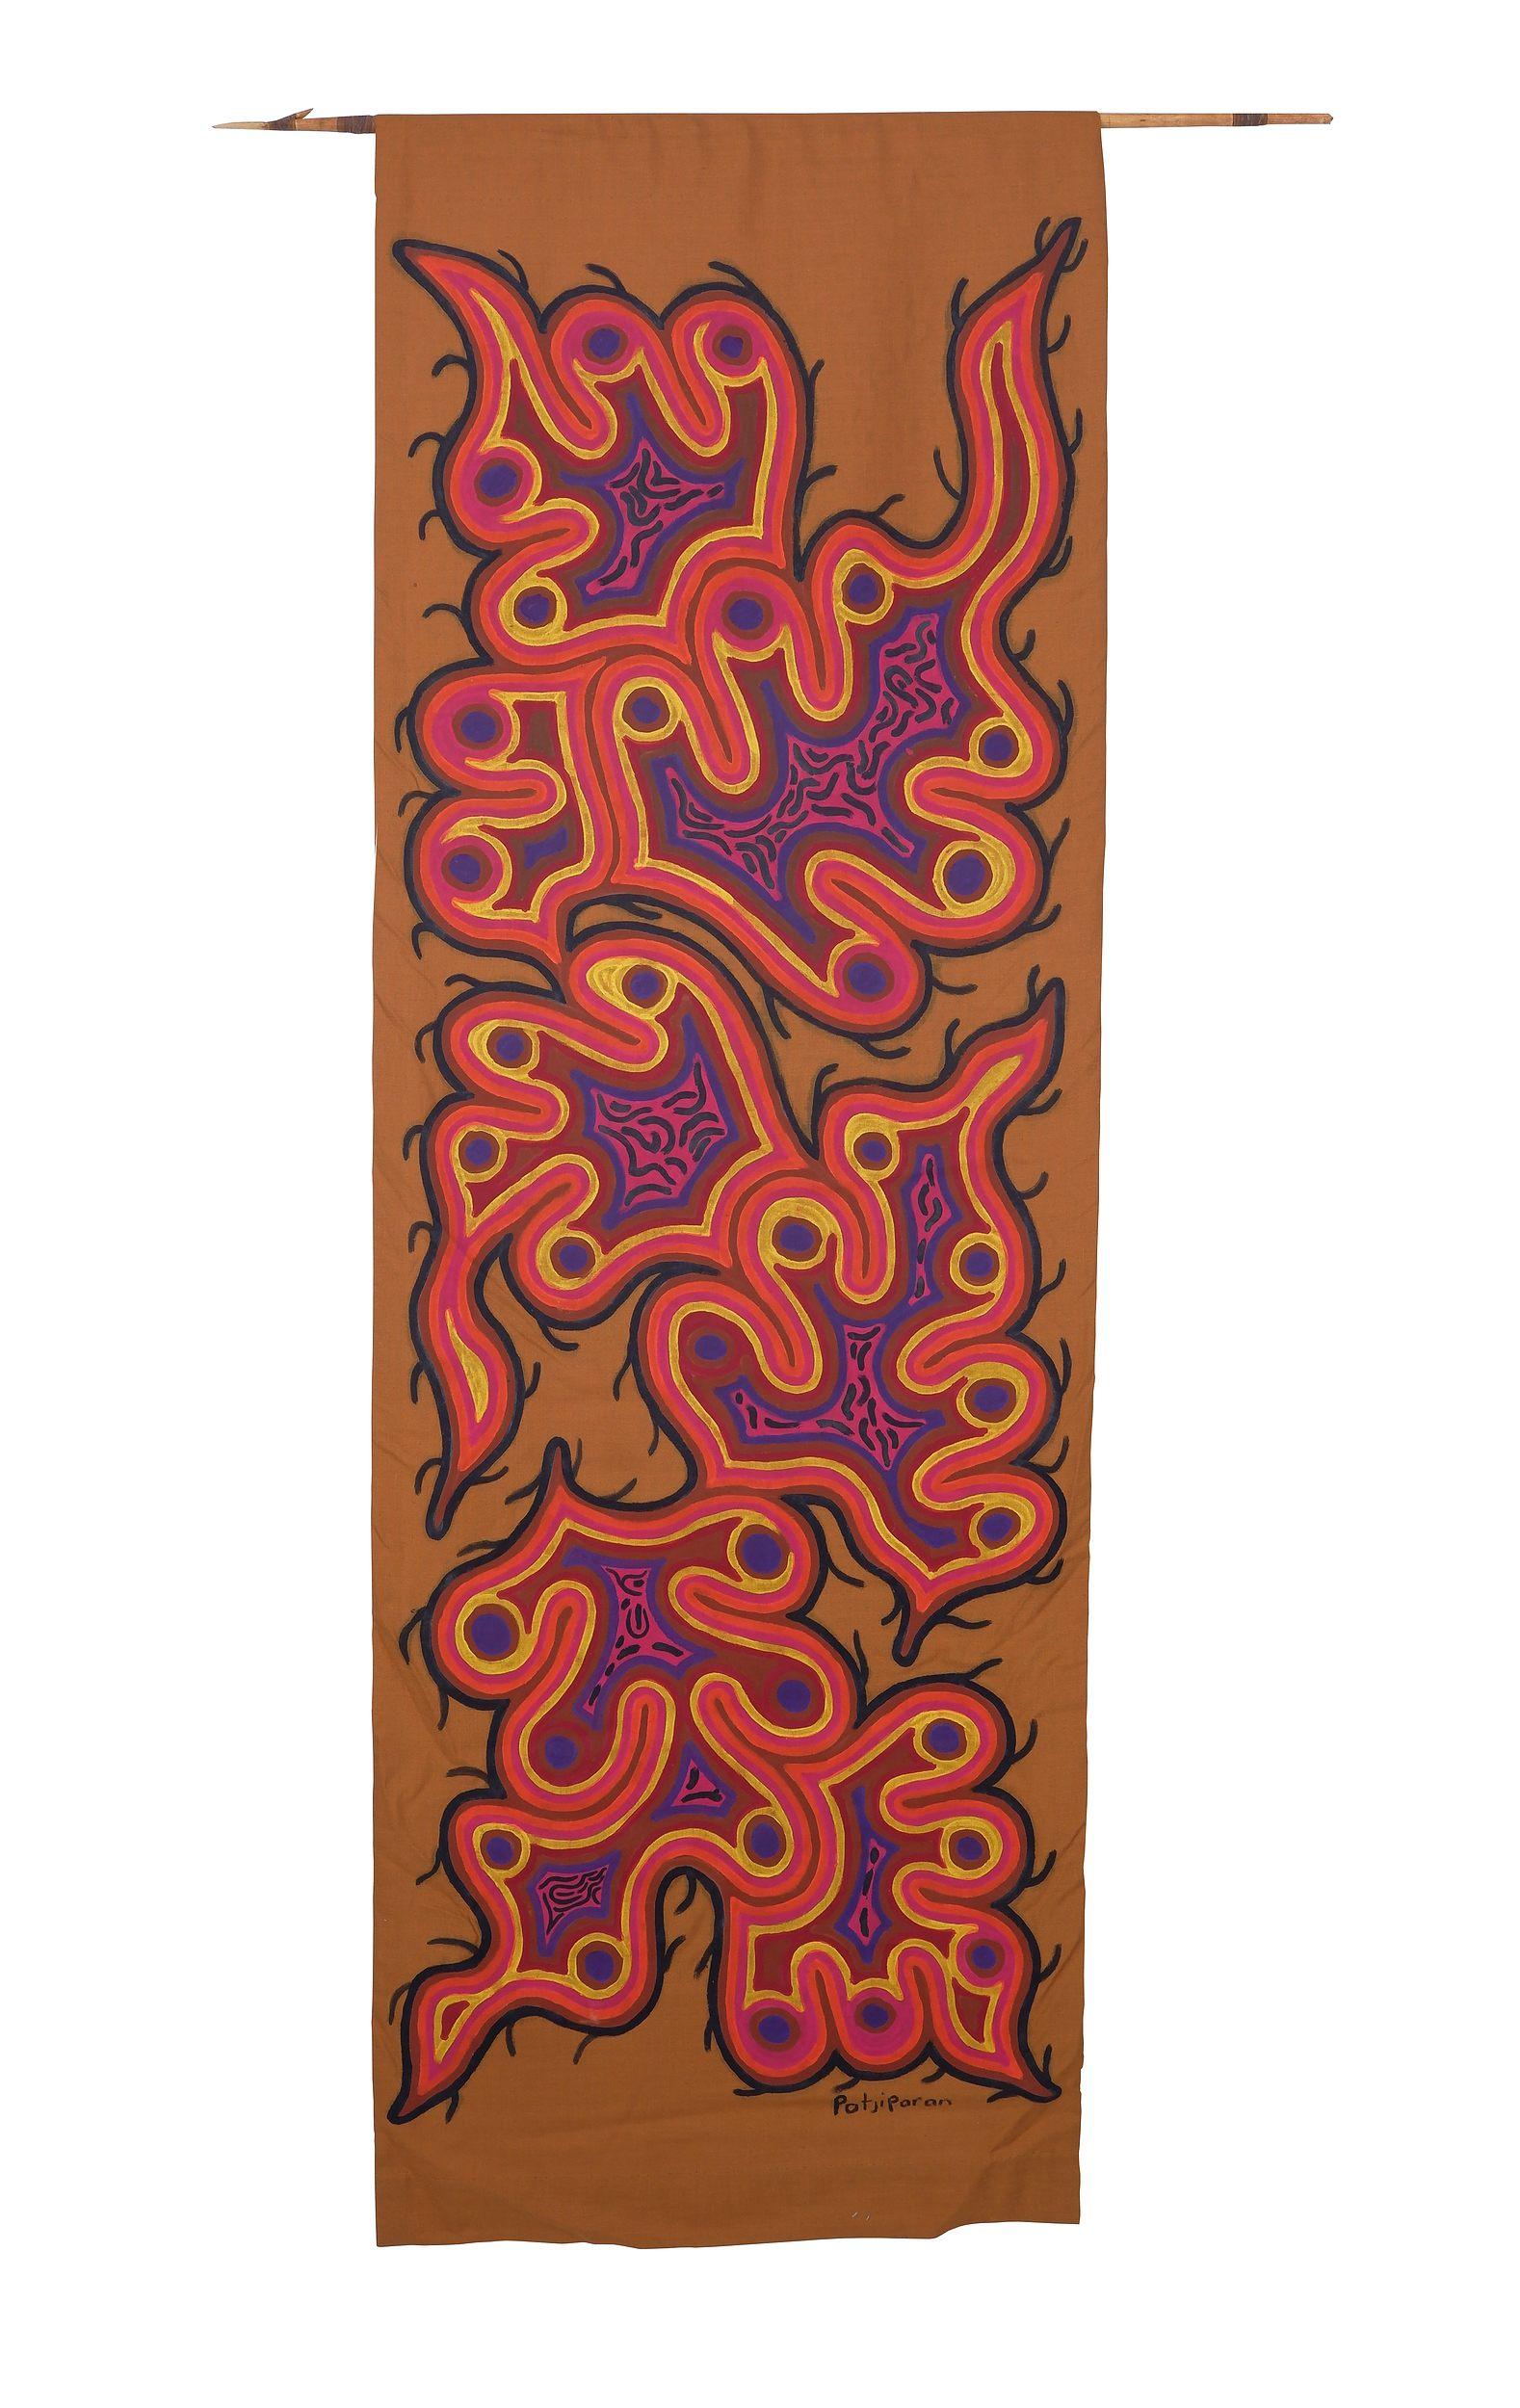 'Patjiparan Daisy Wikilyiri (c1935-1985, Pitjantjatjara language group), Untitled, Acrylic on Linen '